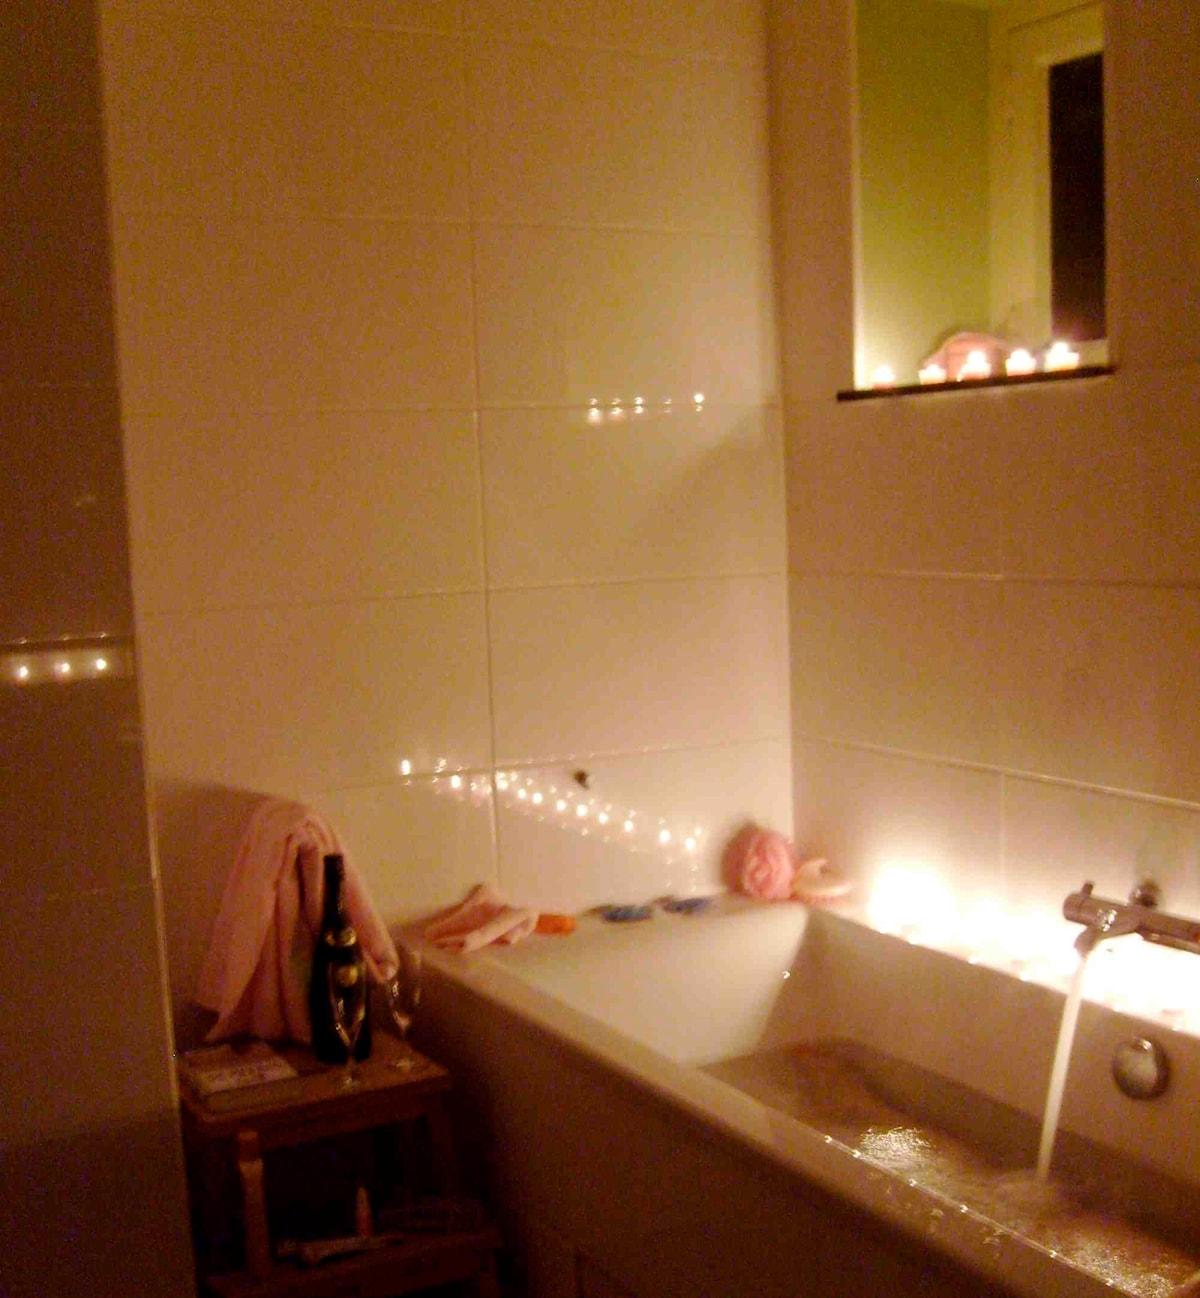 Big Bathroom with bathtub and separate shower / de grote badkamer met bad en douche